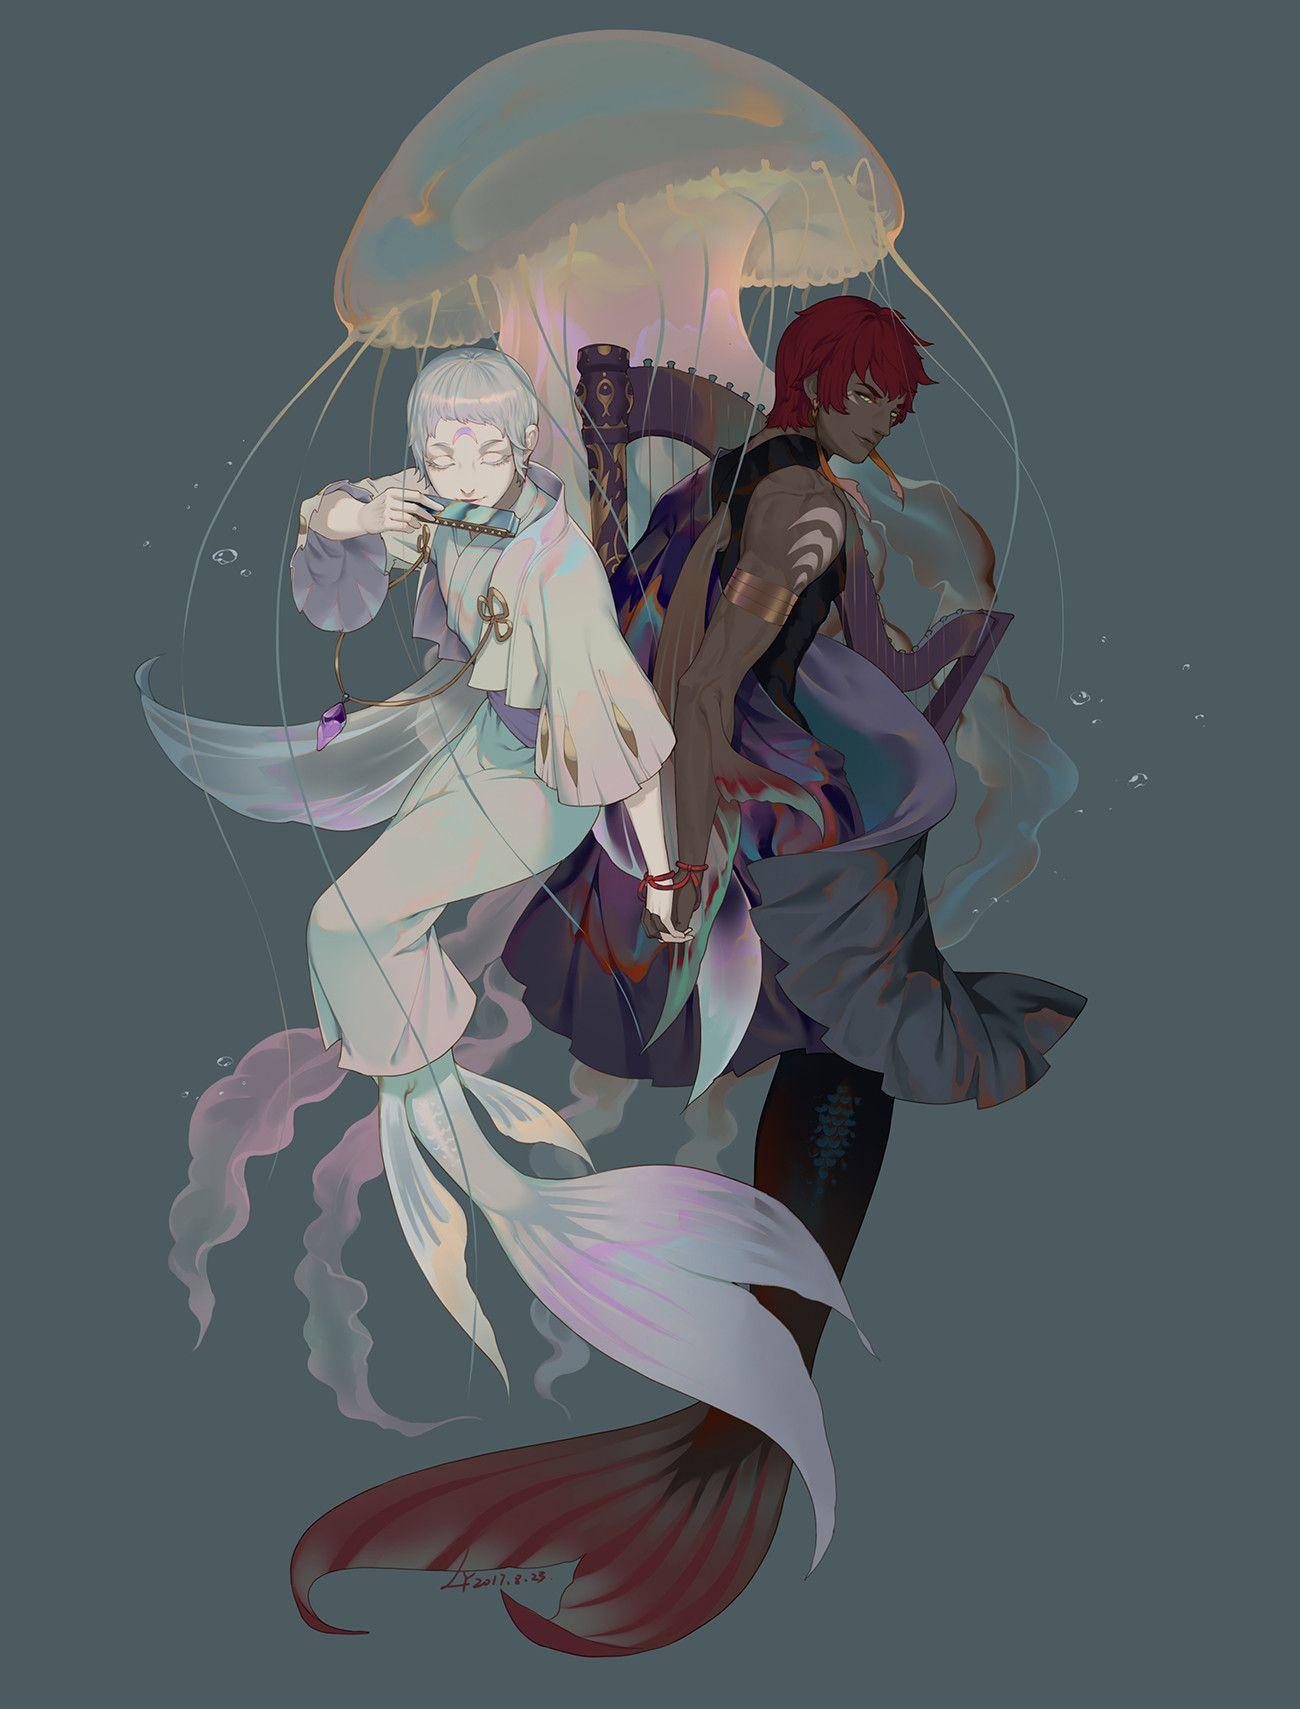 ArtStation 和服双鱼座, LY 炼妖 キャラクターデザイン, 插画, 画